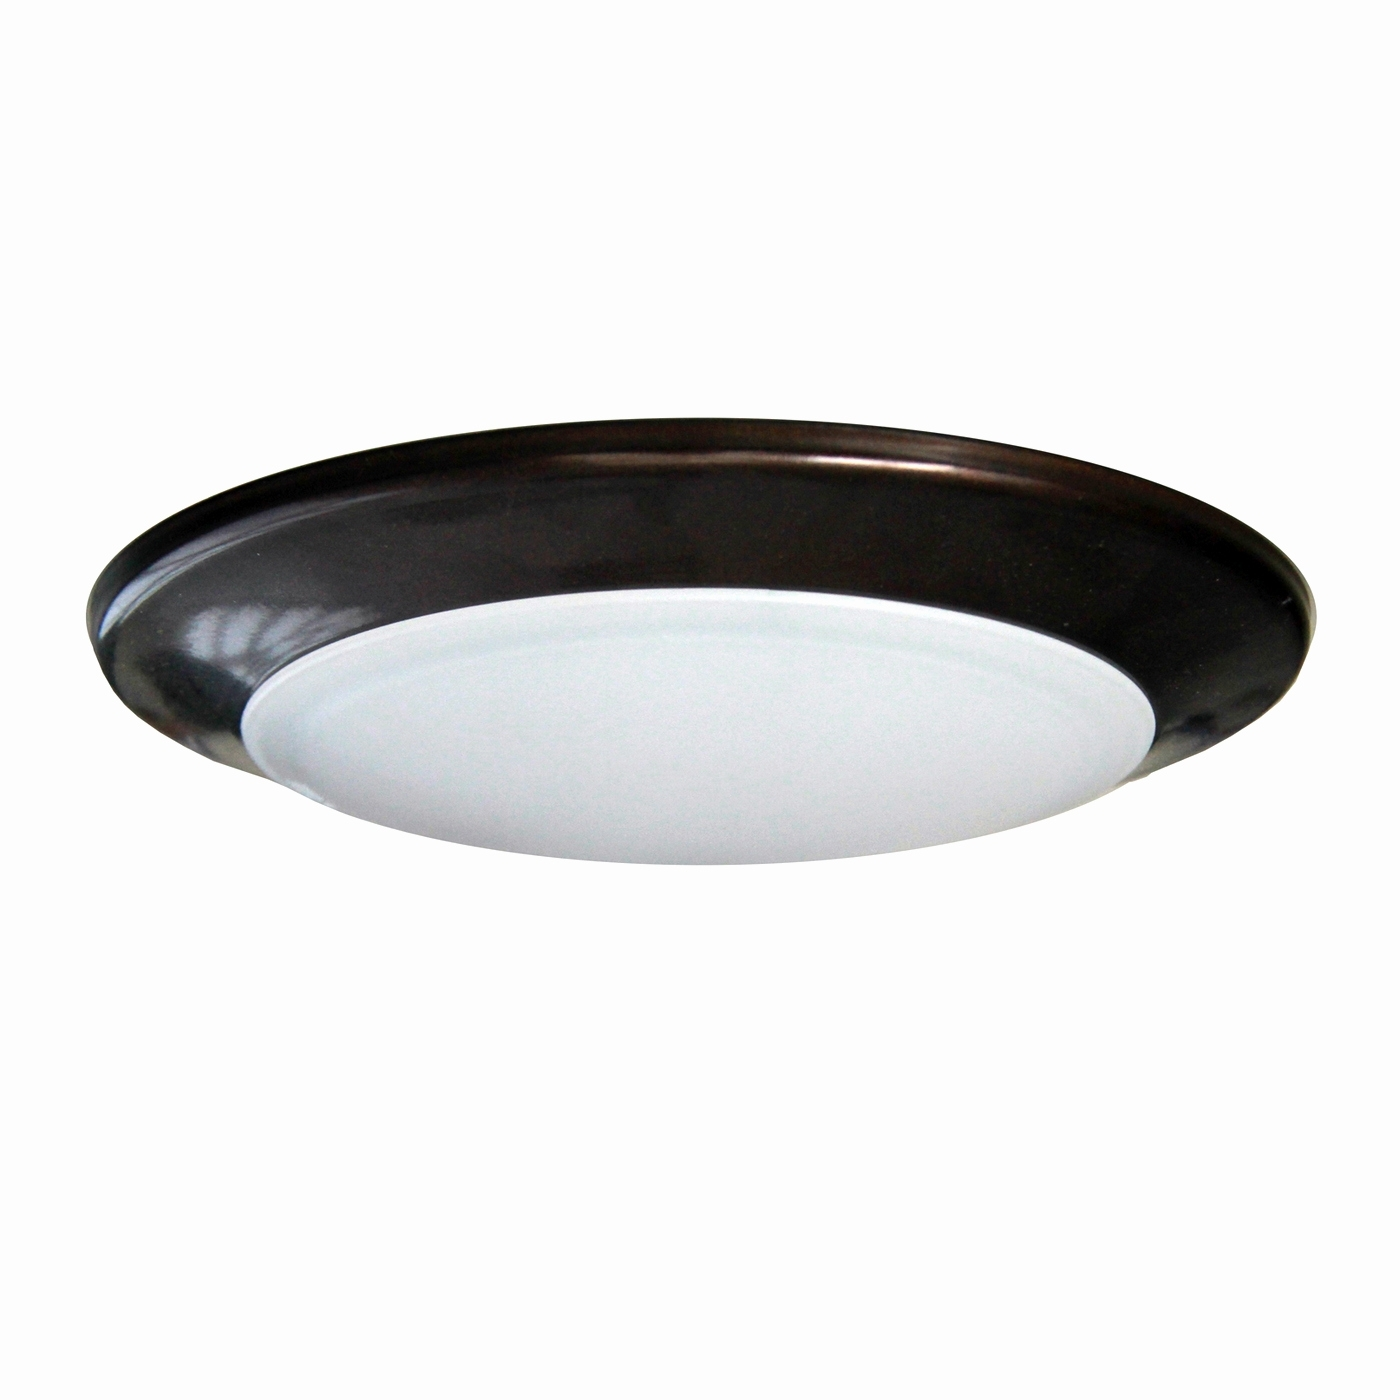 Ceiling Light : Back Porch Ceiling Lights Outdoor Ceiling Lights In Outdoor Ceiling Lights At Ebay (#2 of 15)